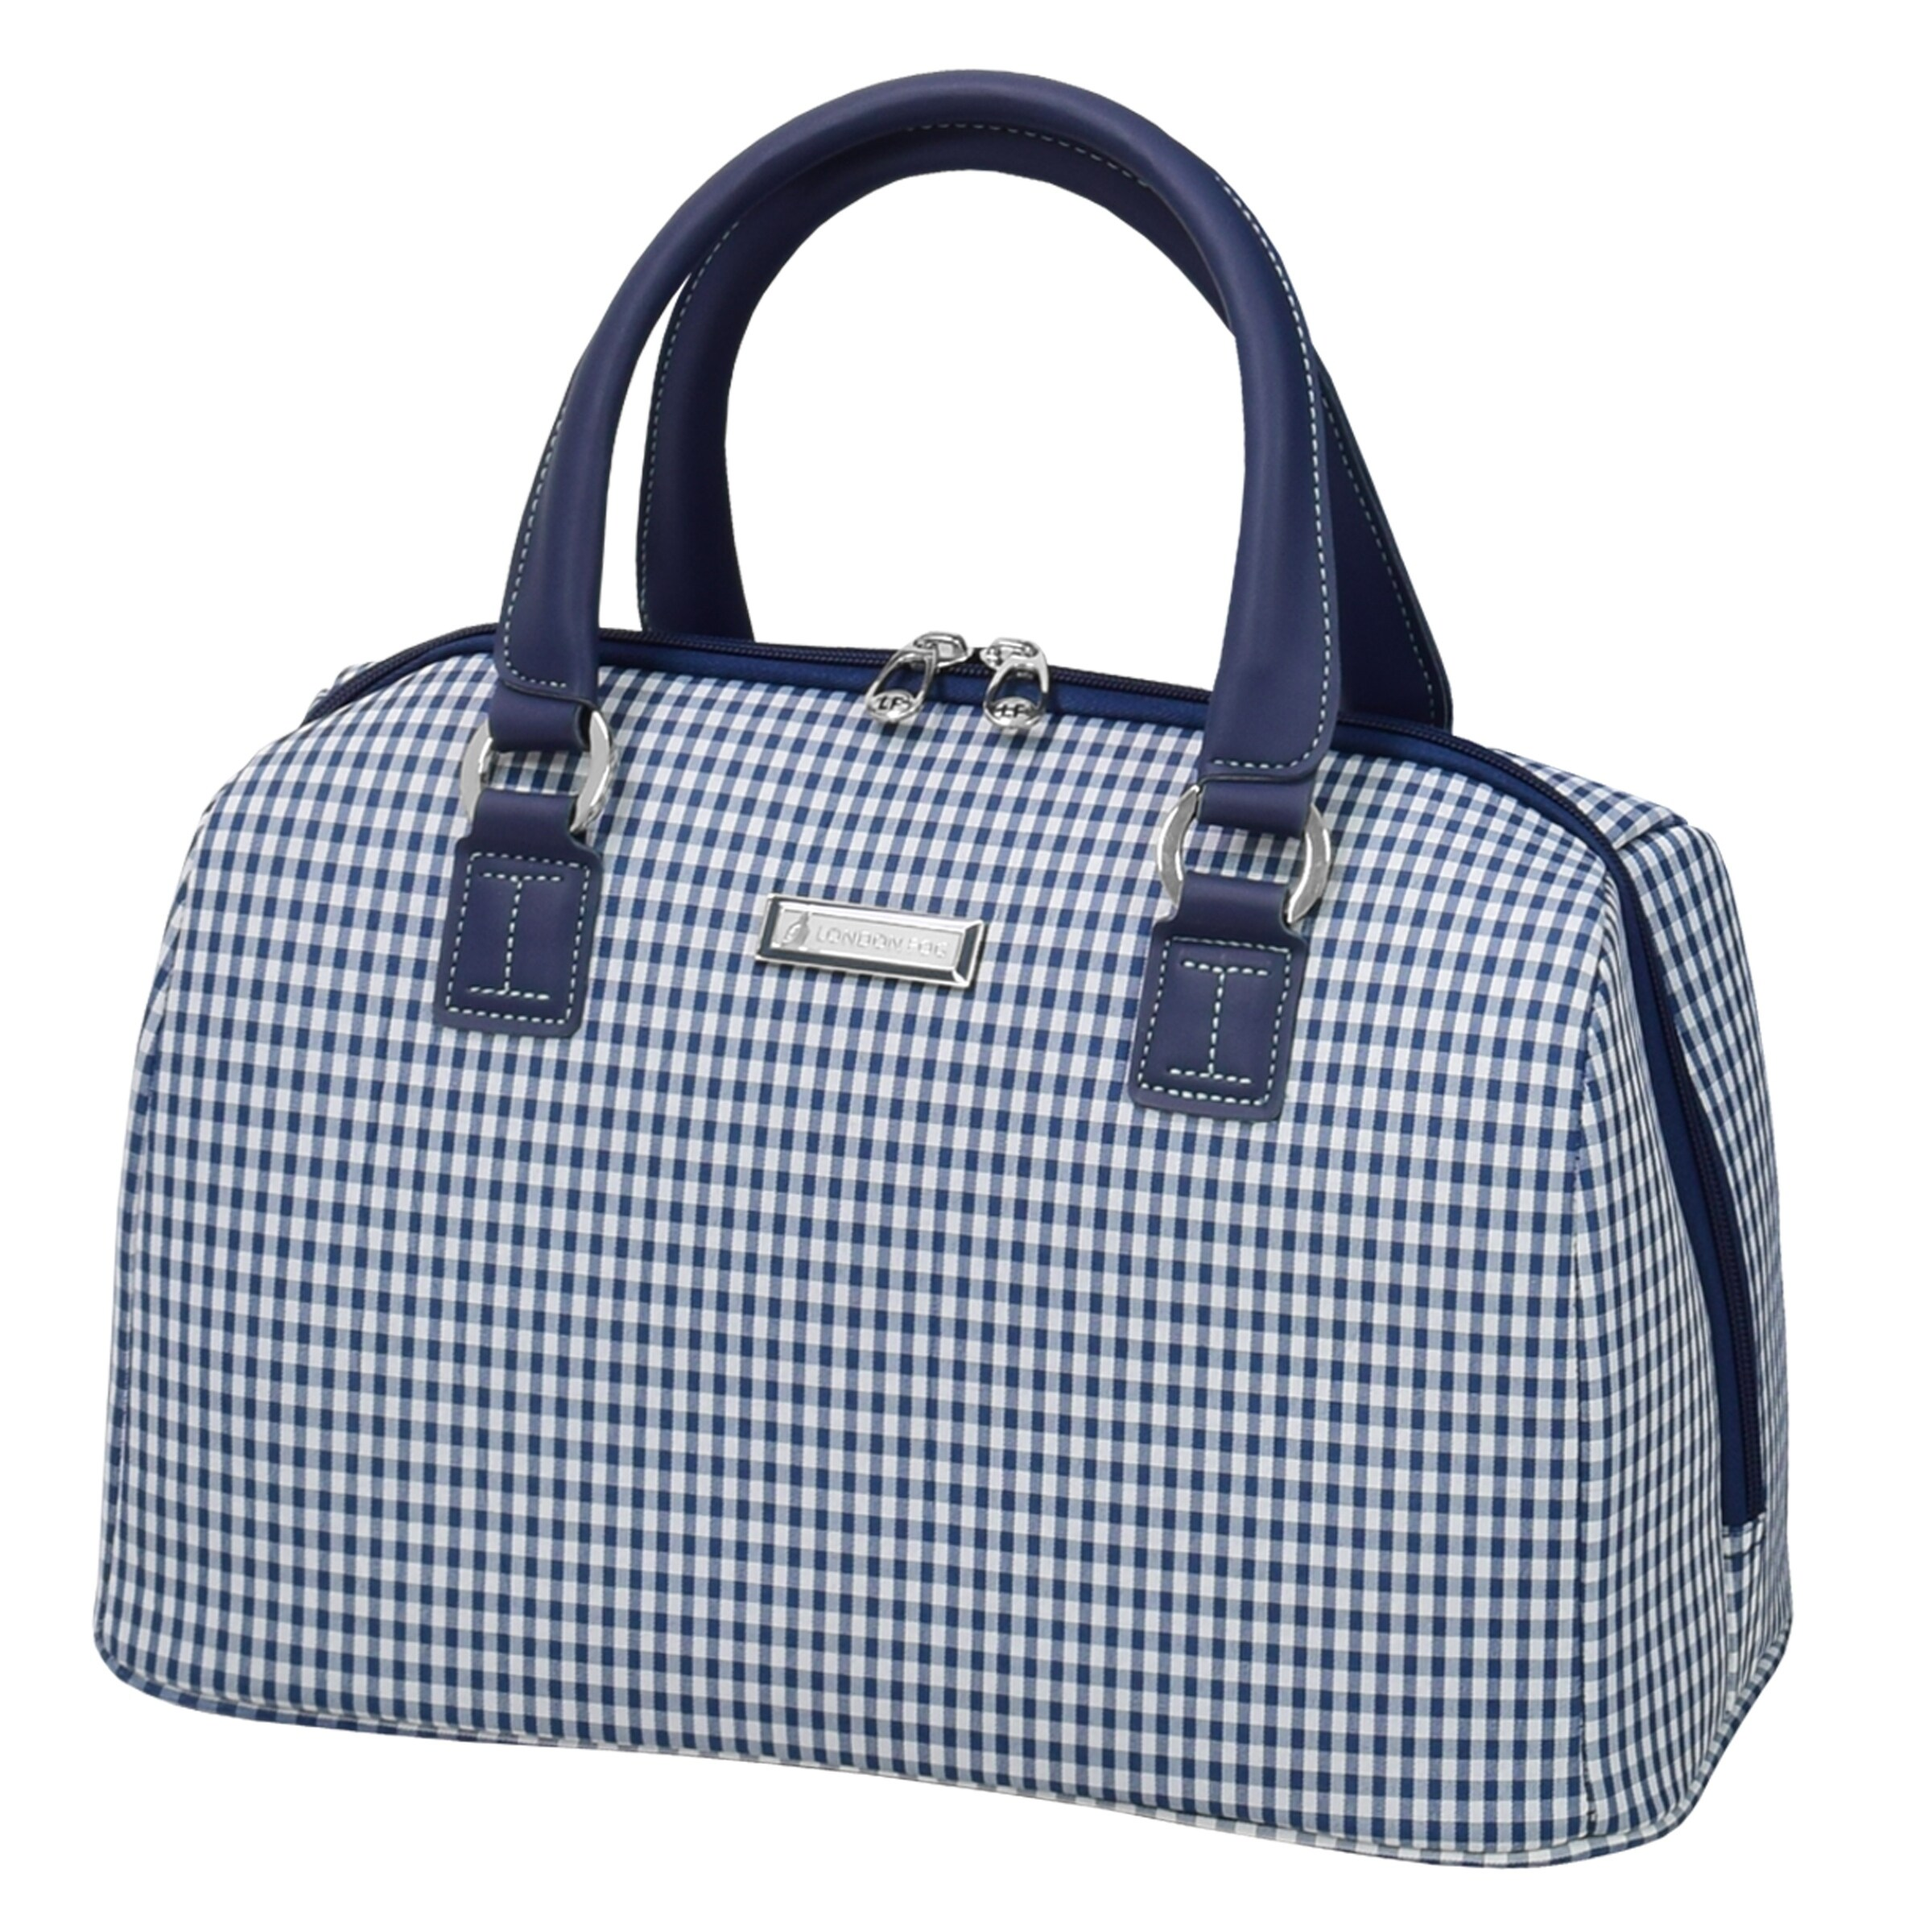 London Fog Hampton 16-inch Carry On Satchel Tote Bag (Nav...